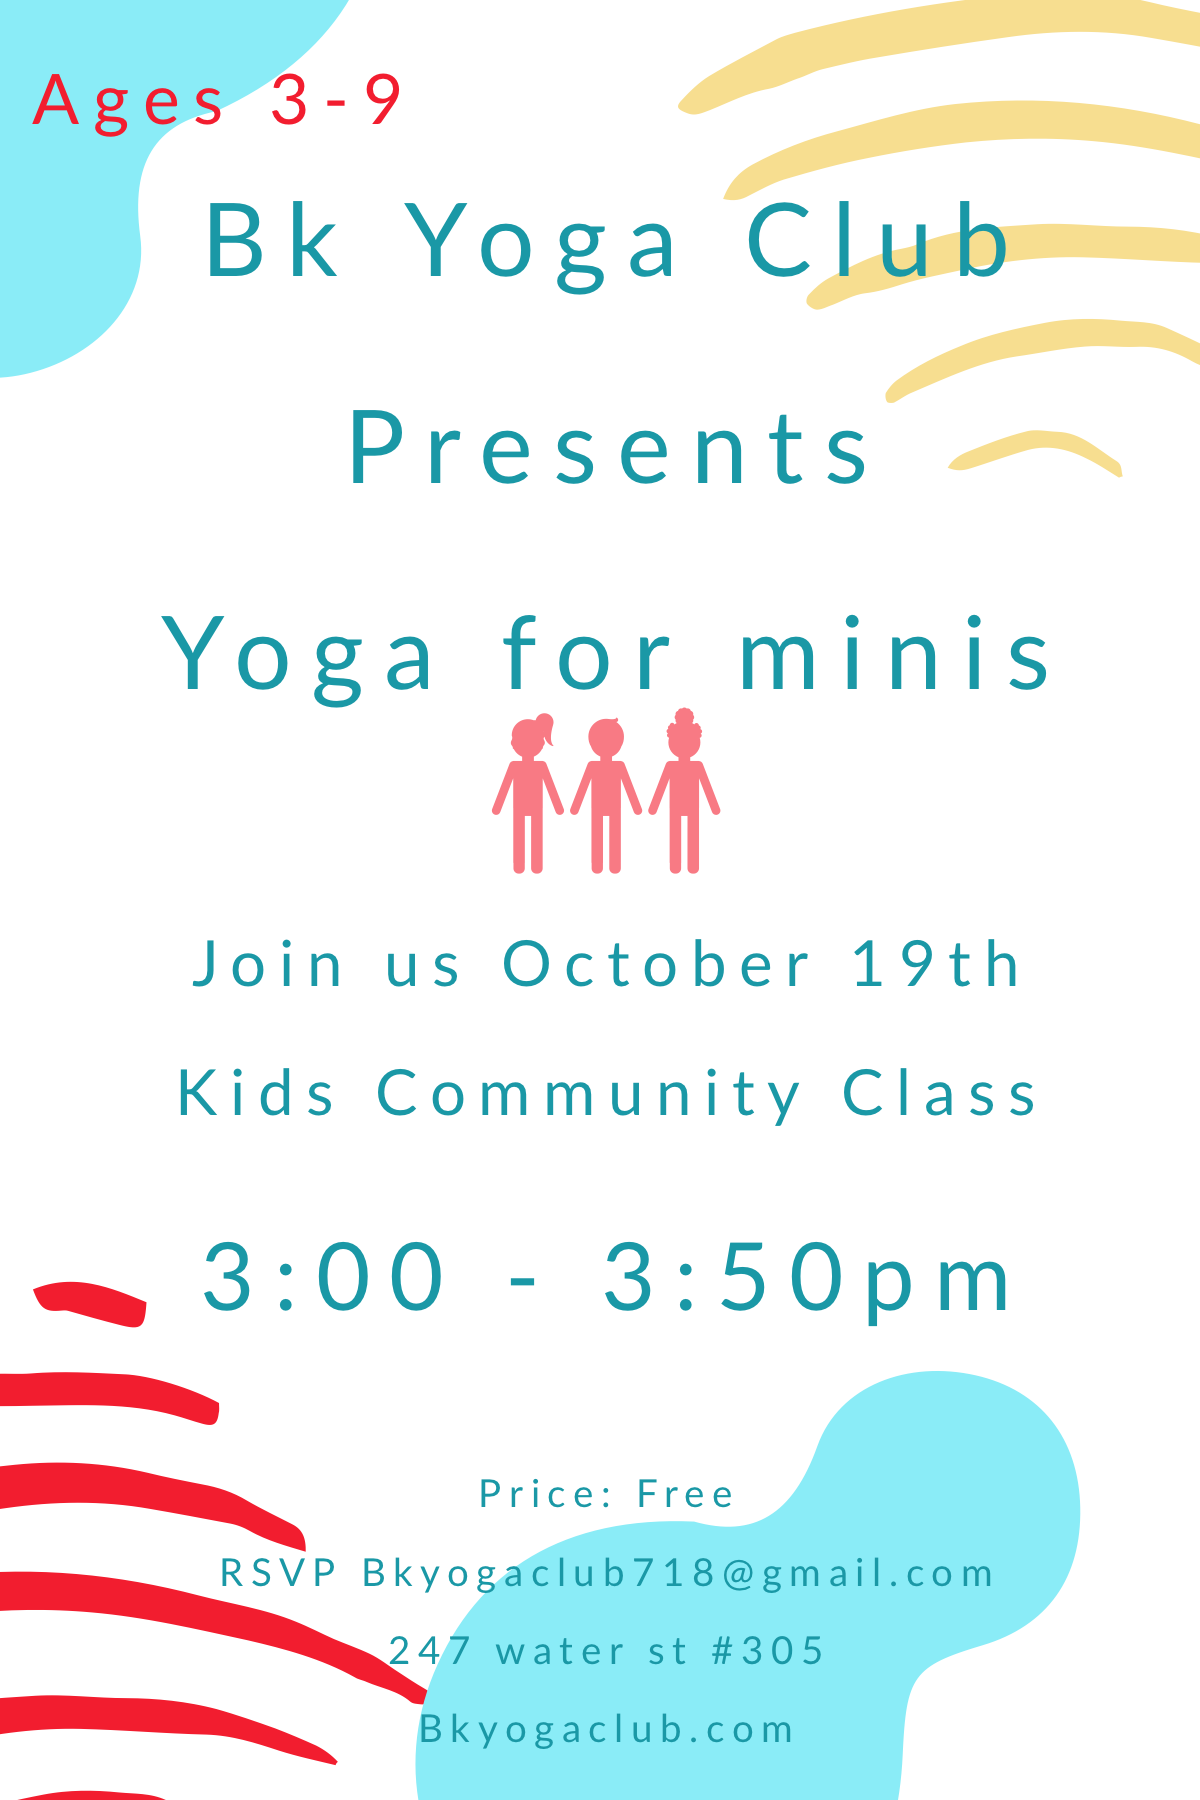 Bk Yoga Club Kids Yoga Class